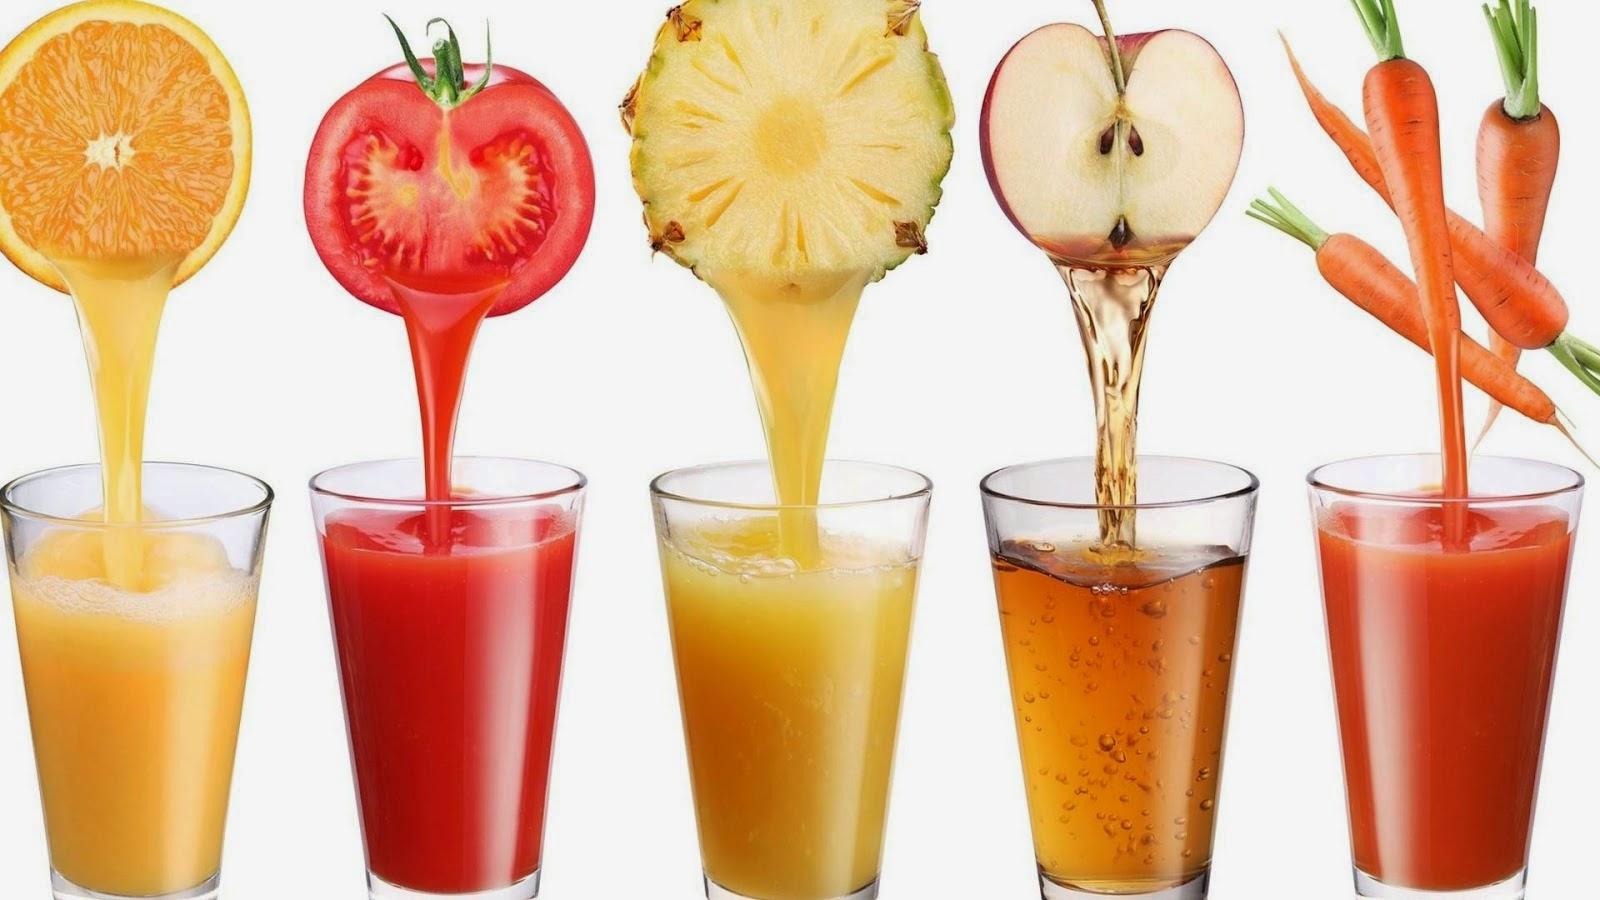 bisnis jus buah